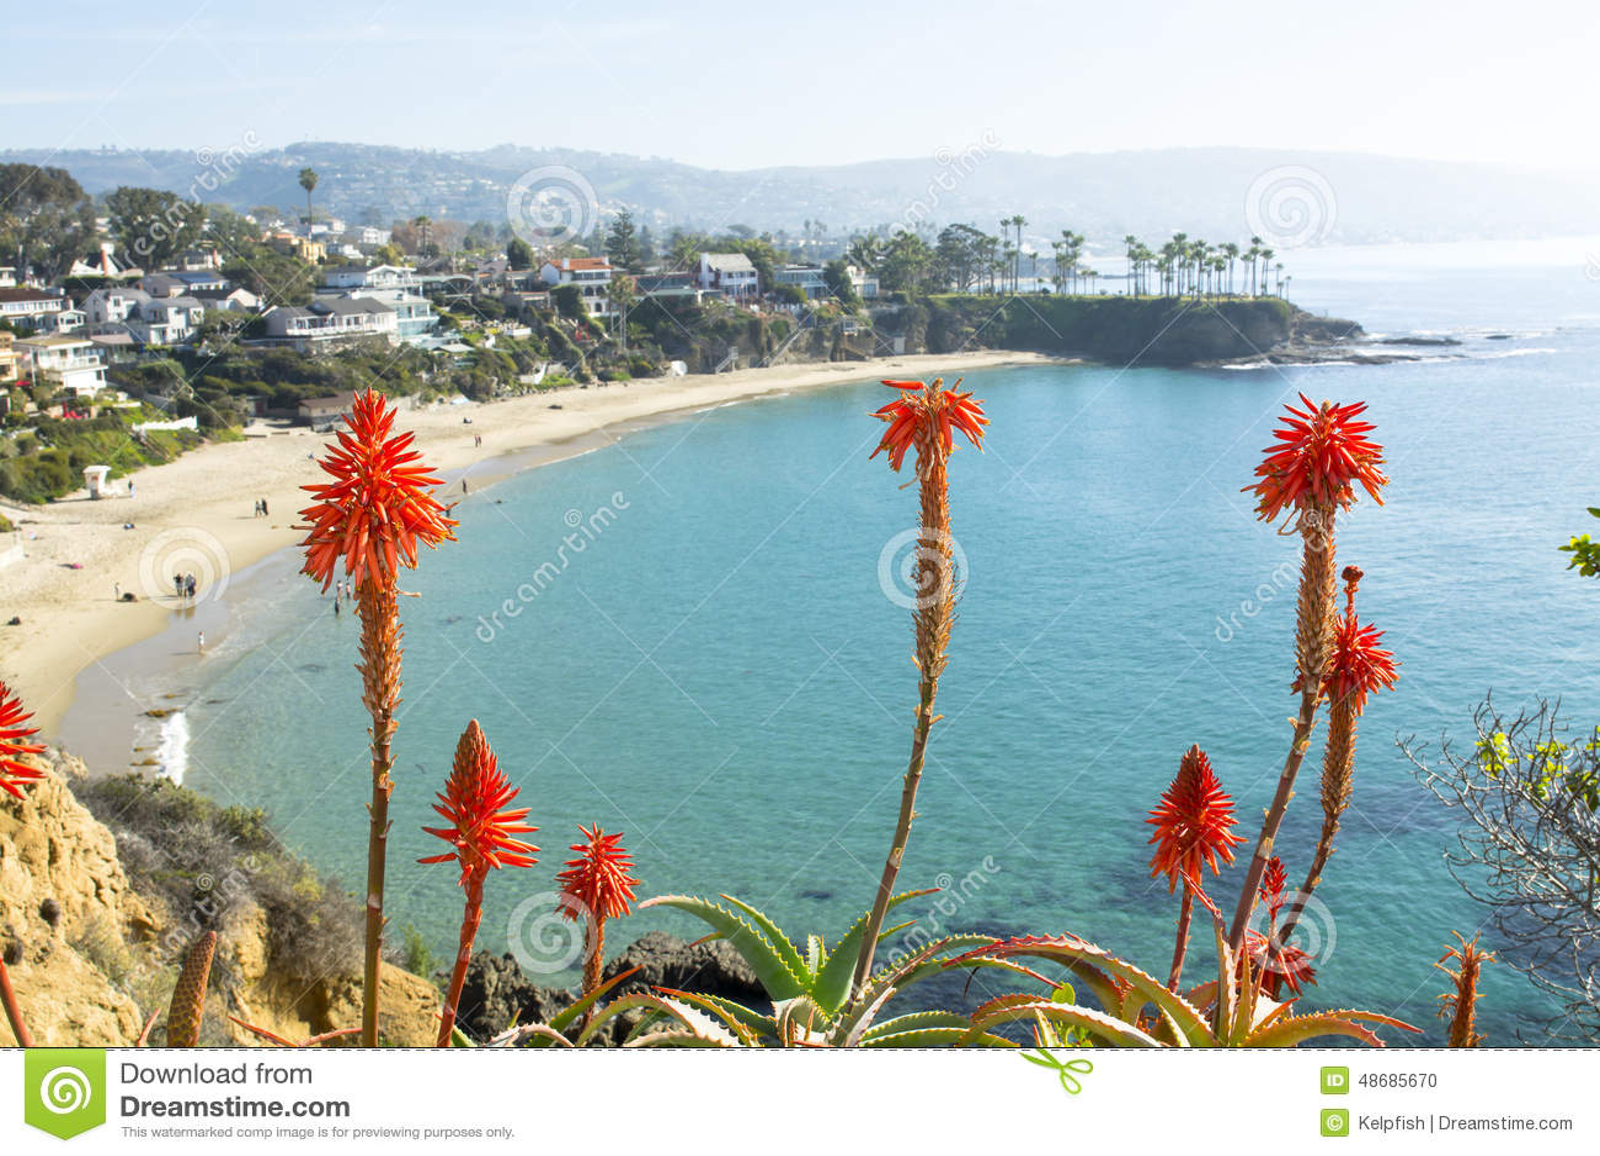 Flowers over beach cove